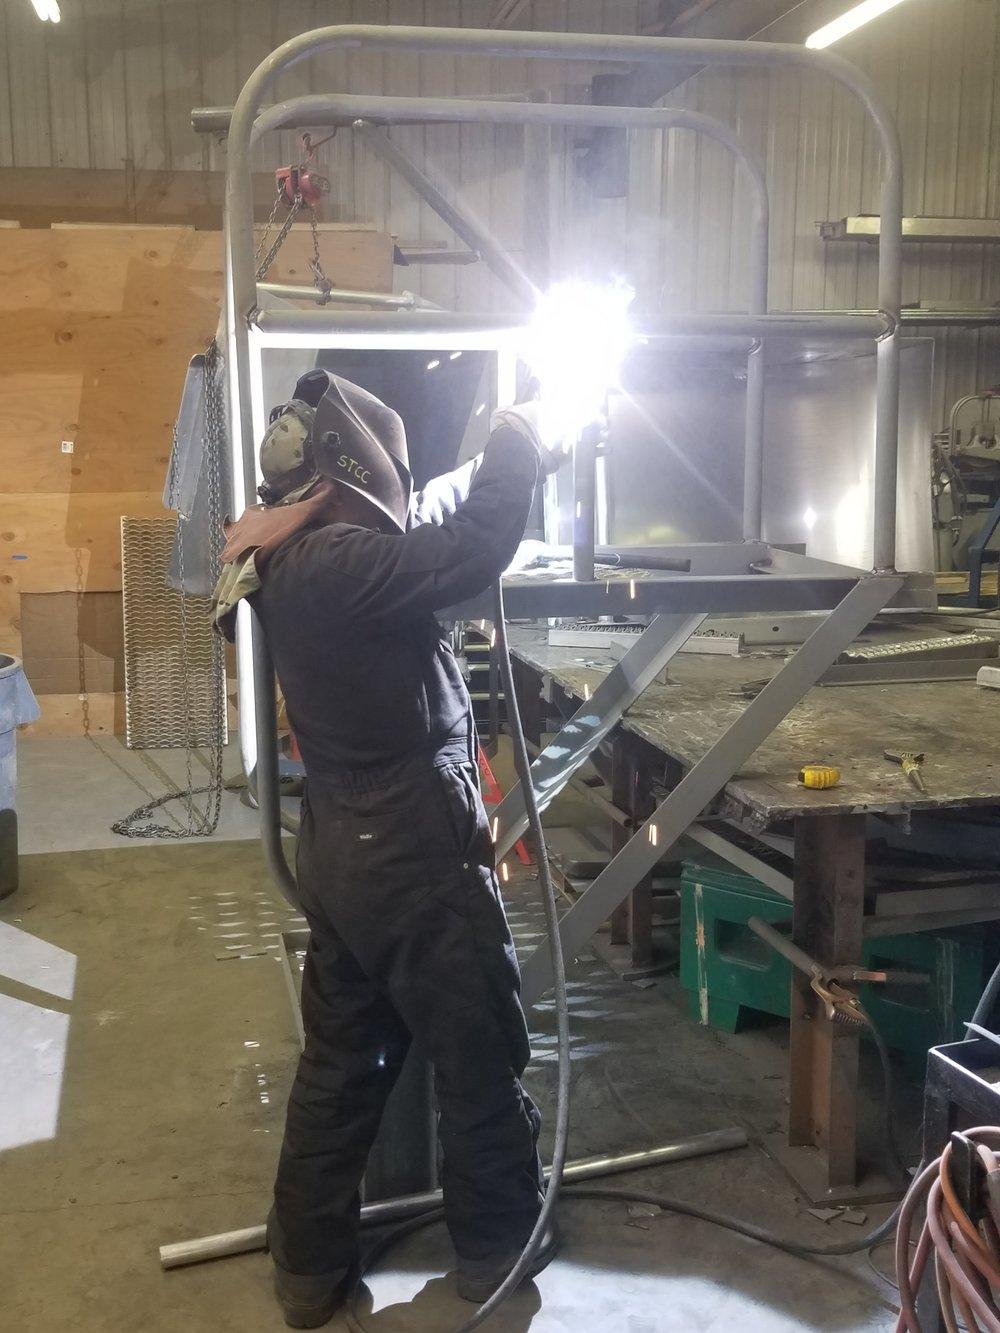 willy welding.jpg